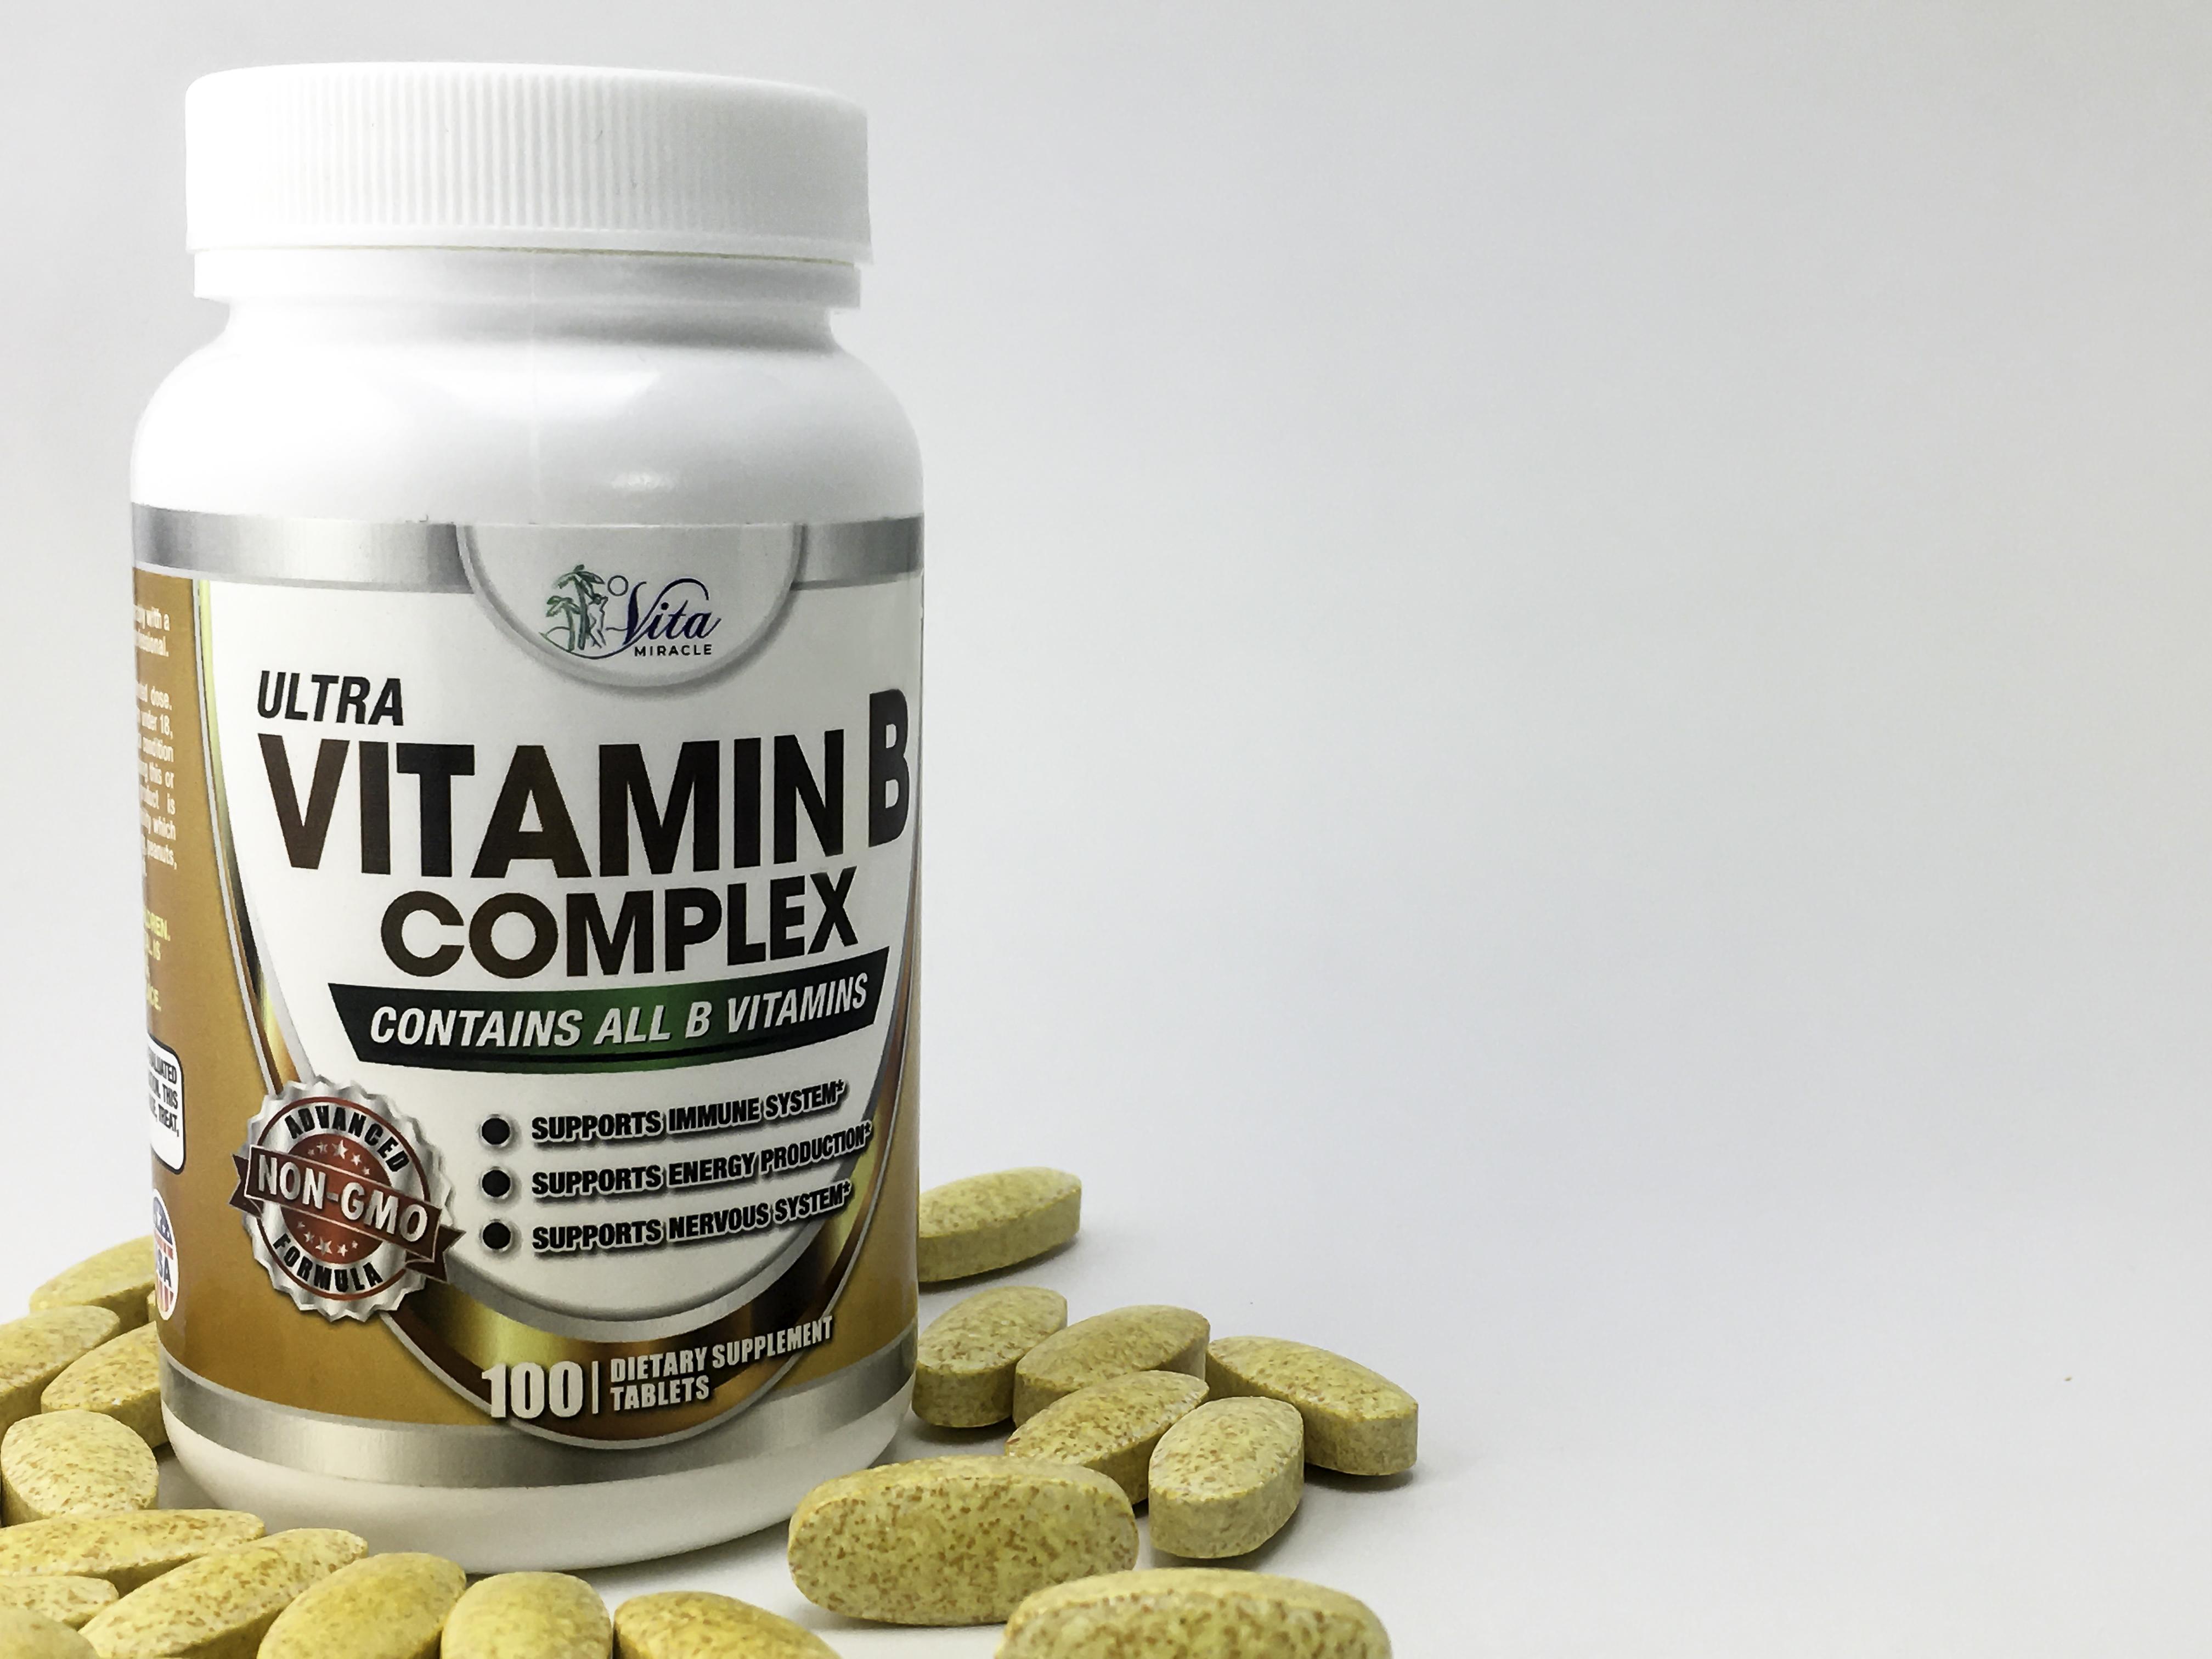 Vita Miracle Ultra Vitamin B Complex featured on StyleChicks.com